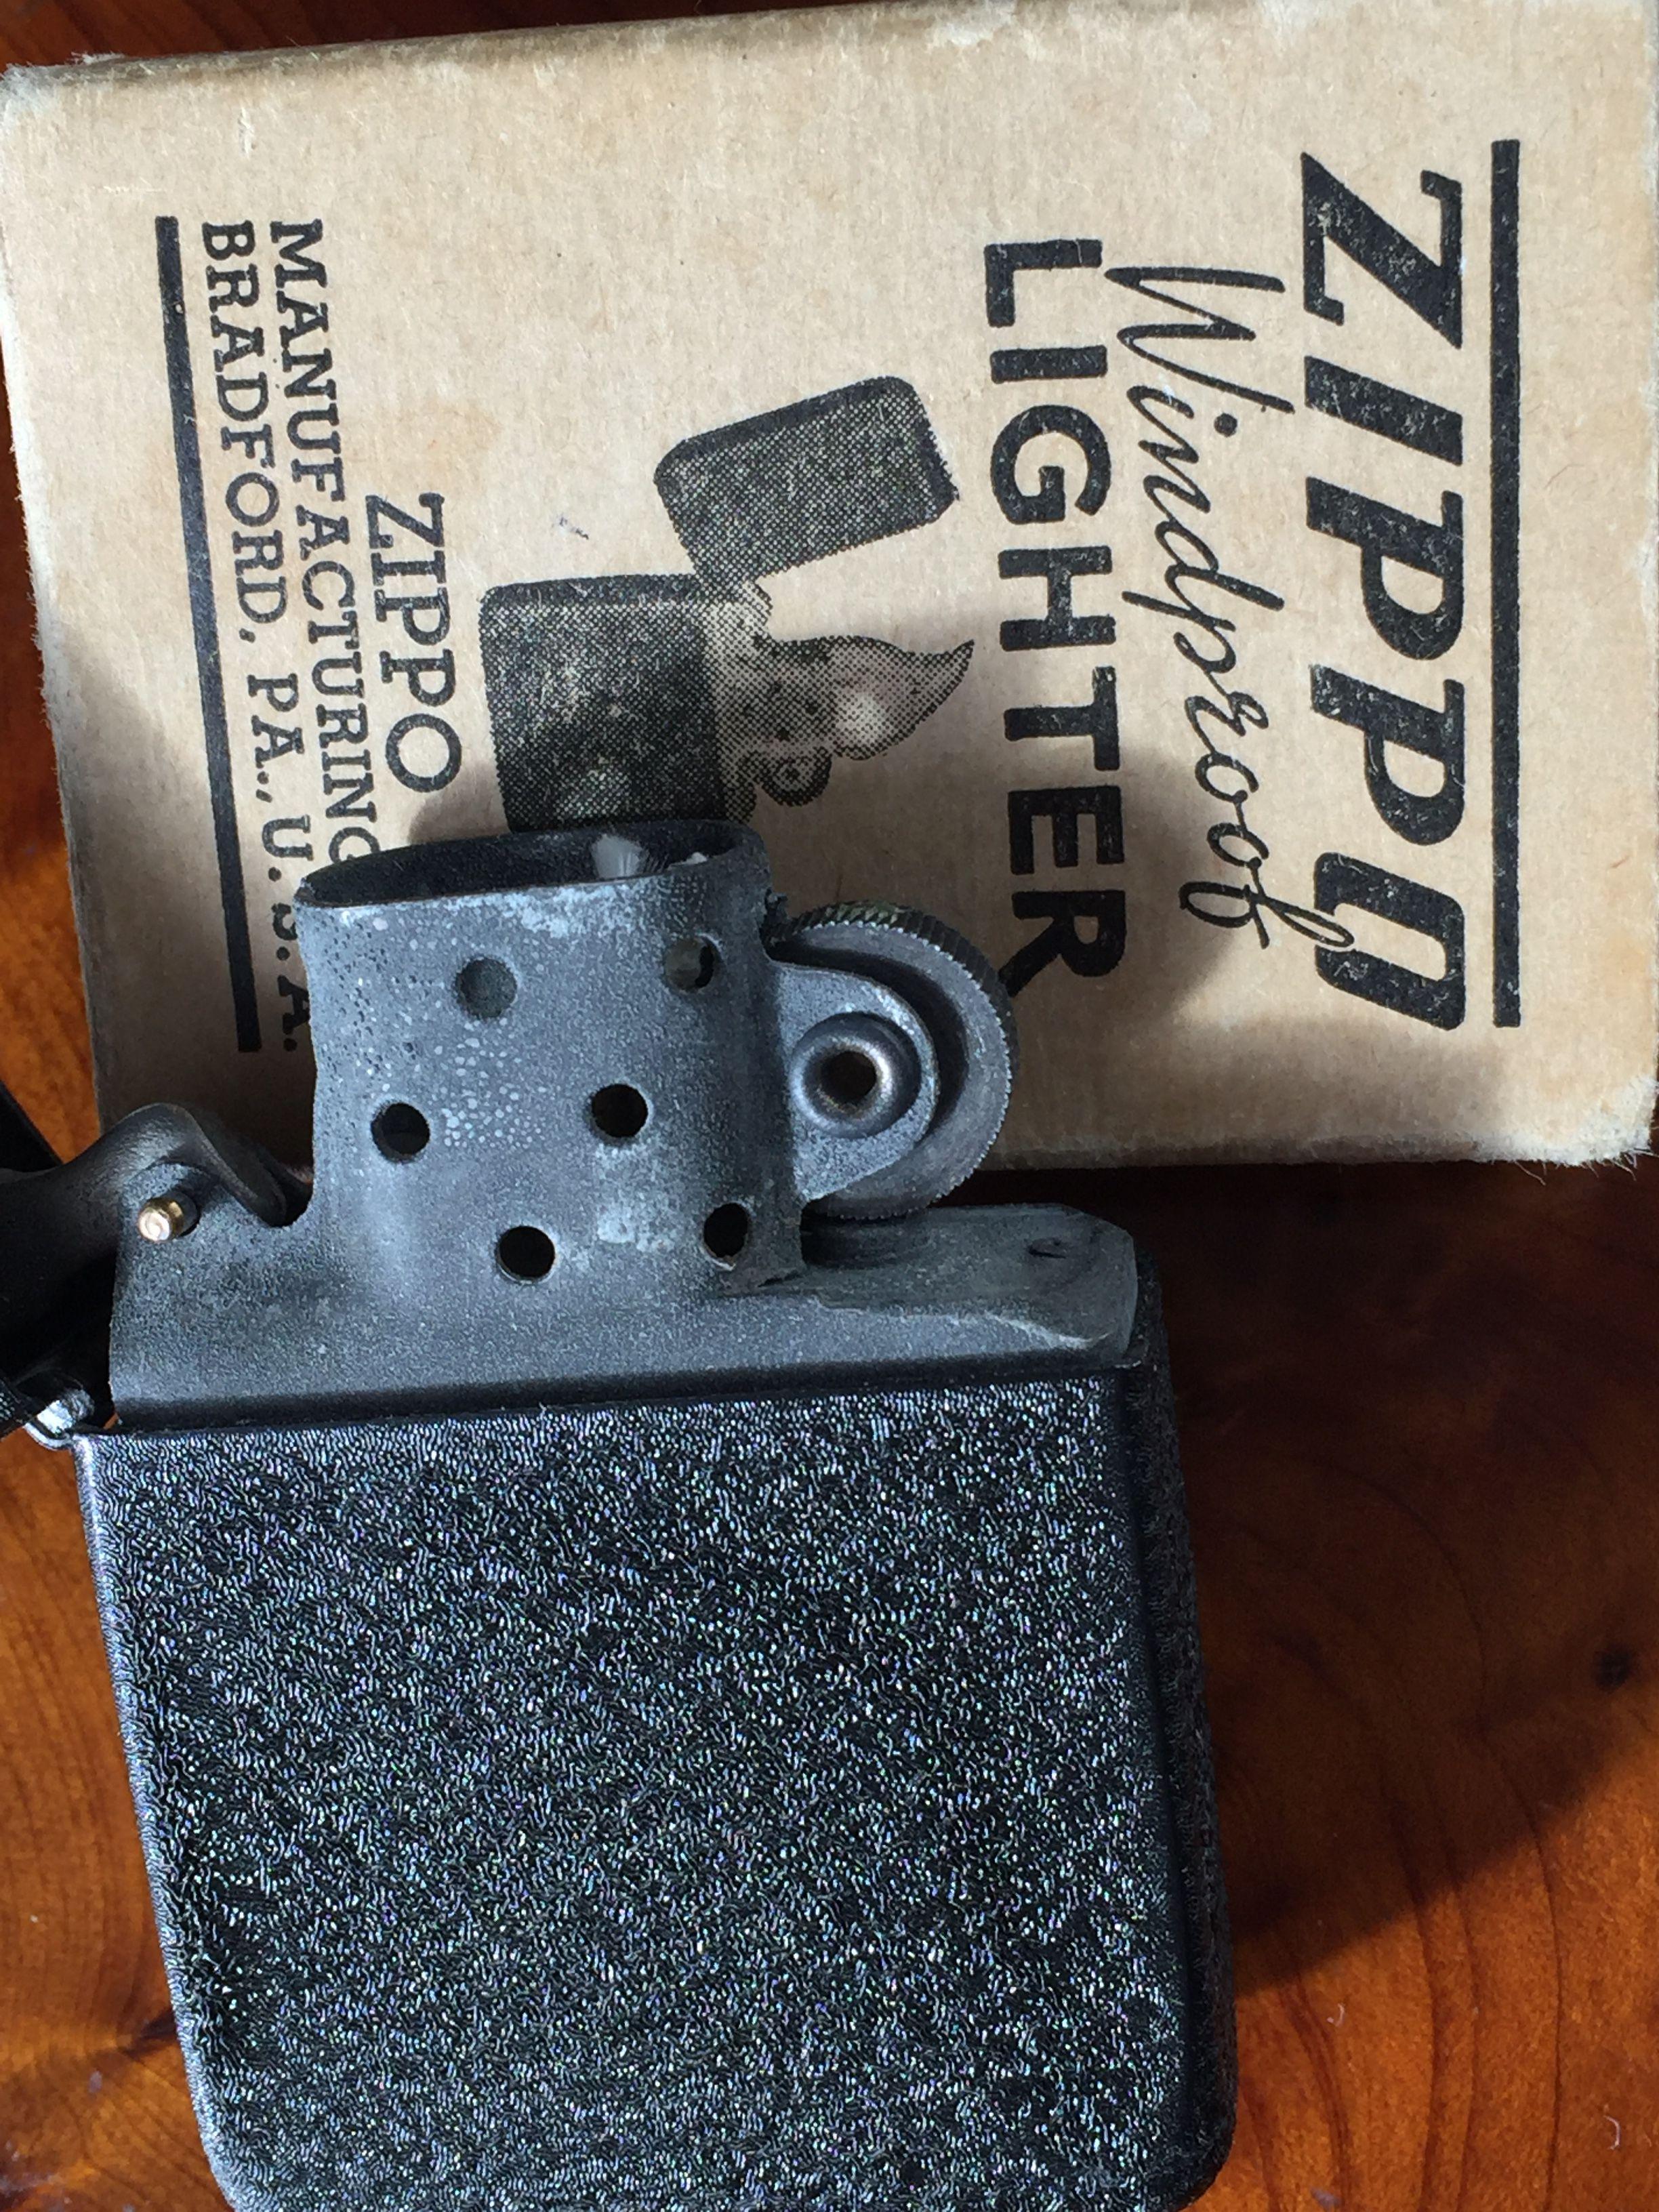 Zippo Black Crackle Lighter New In The Box 1943 Zippo Lighter Zippo Lighter